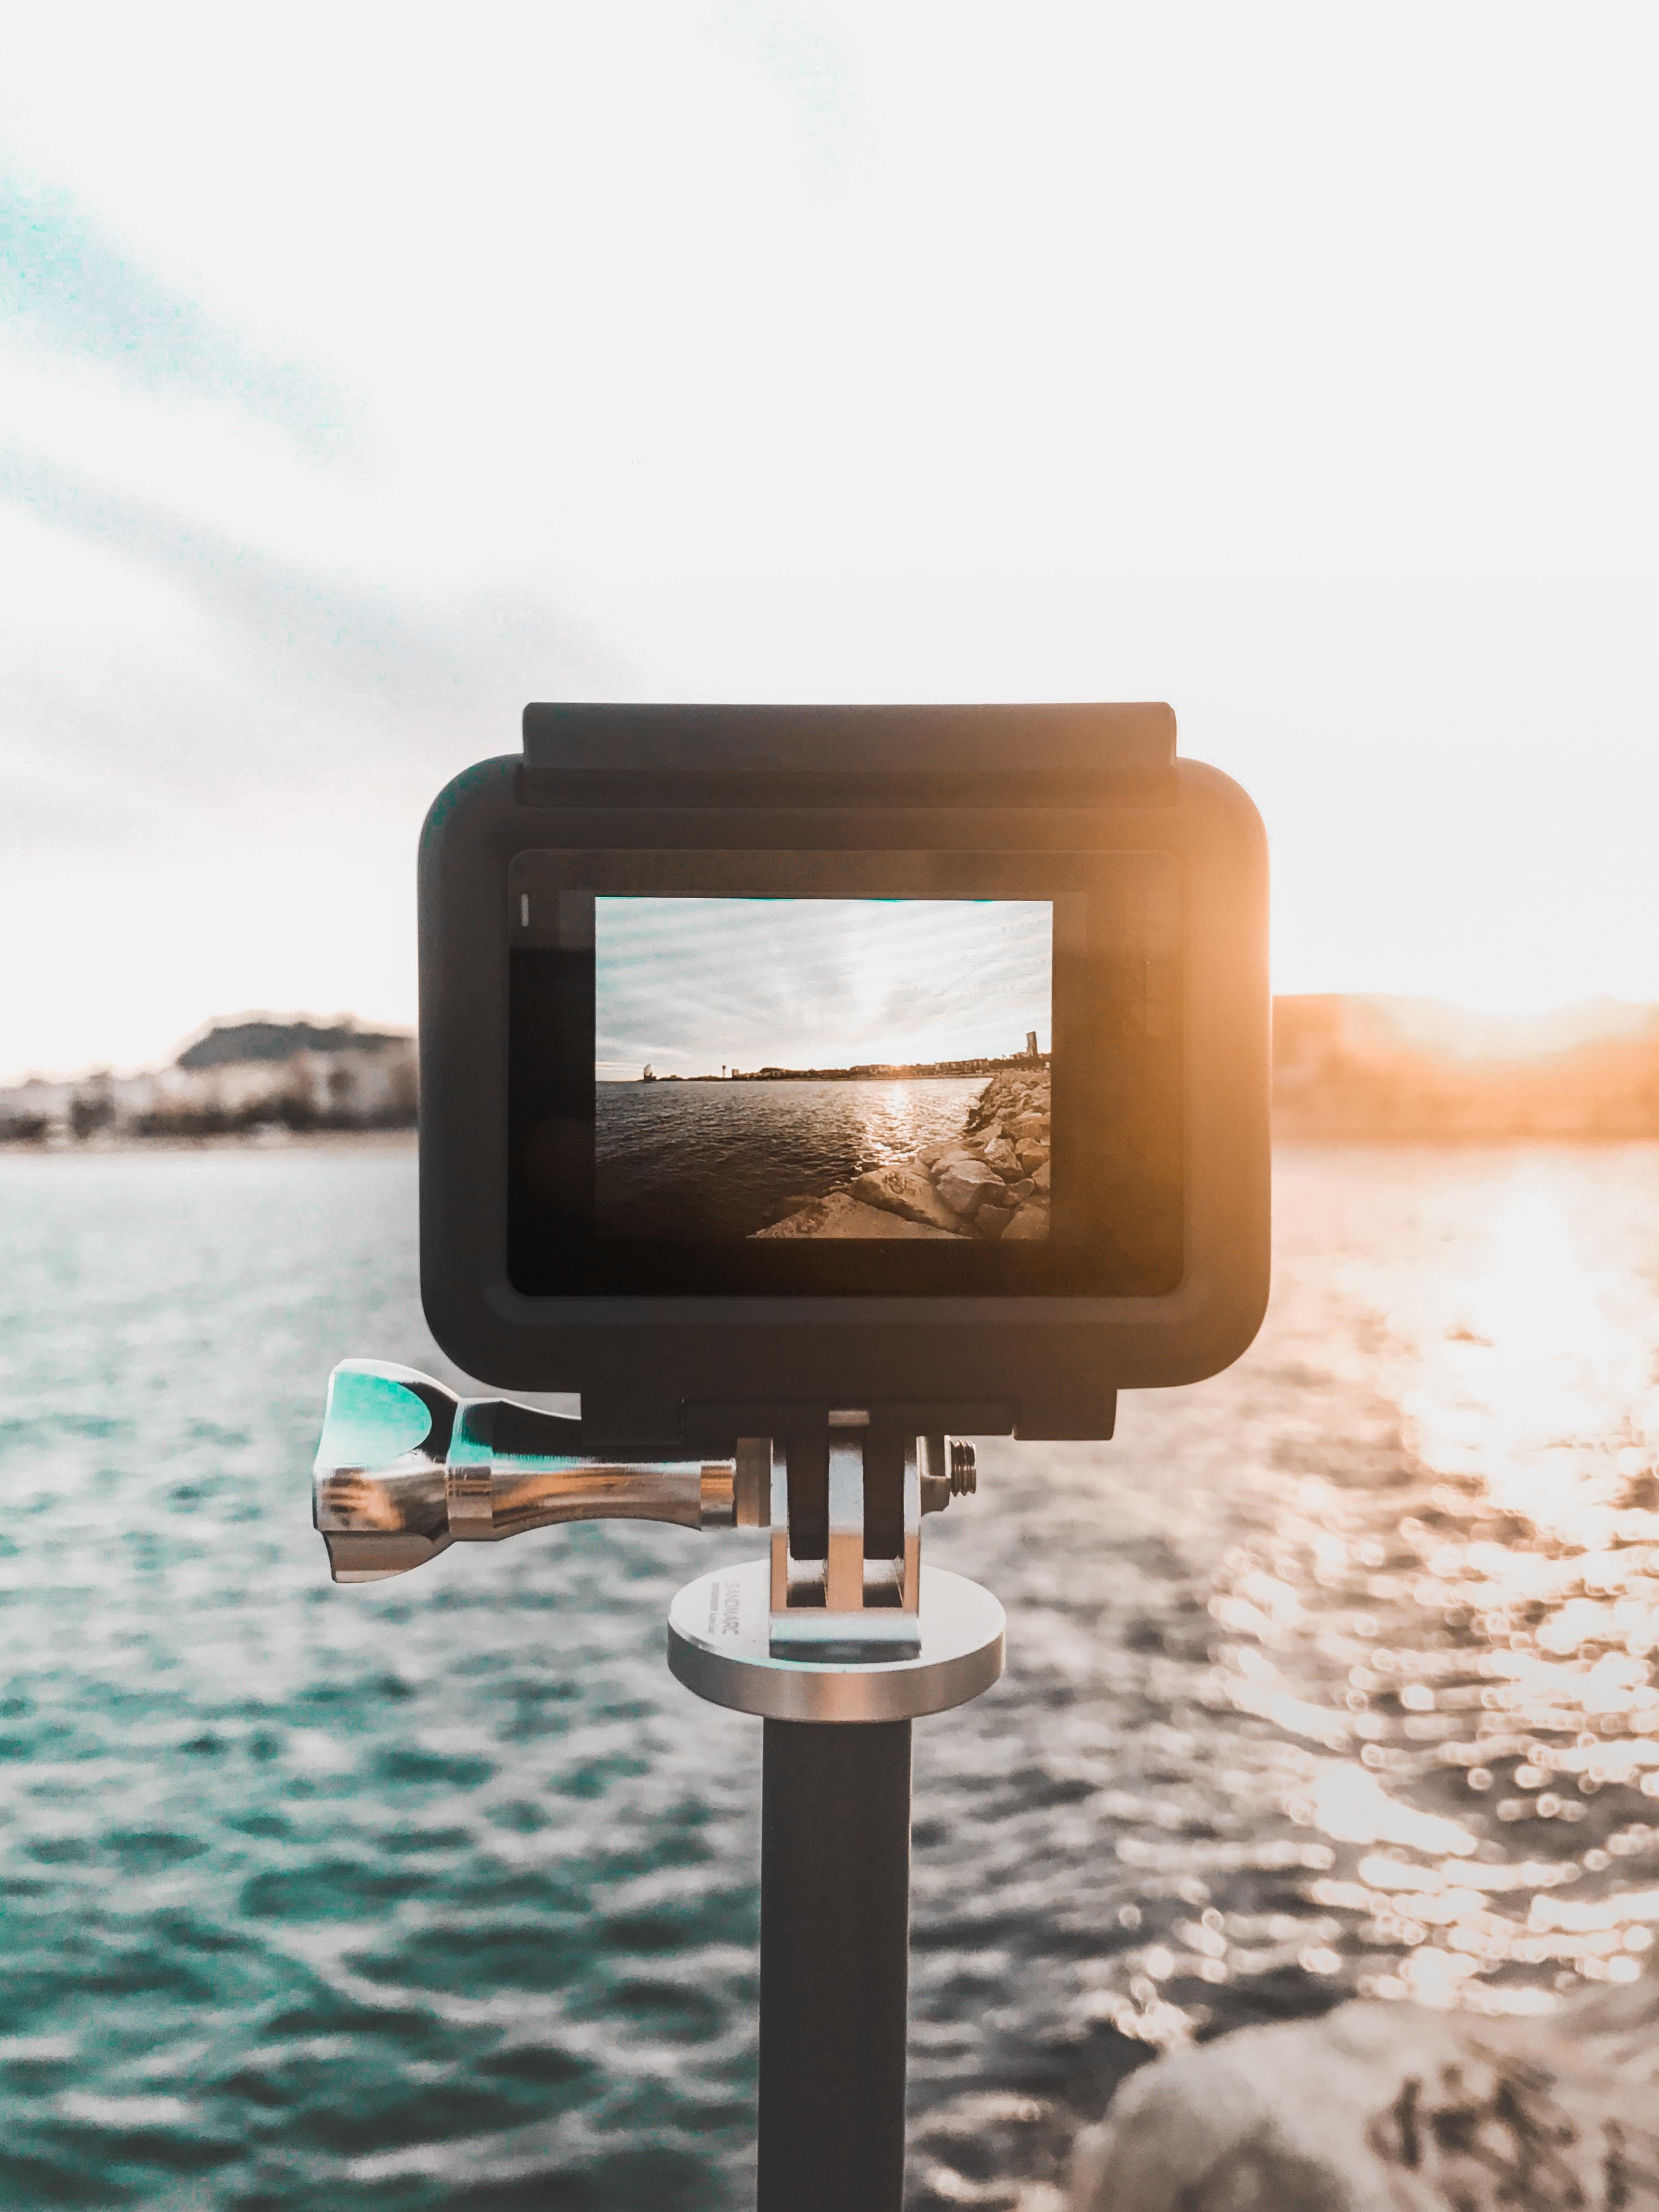 ocean showing on black camera during daytime